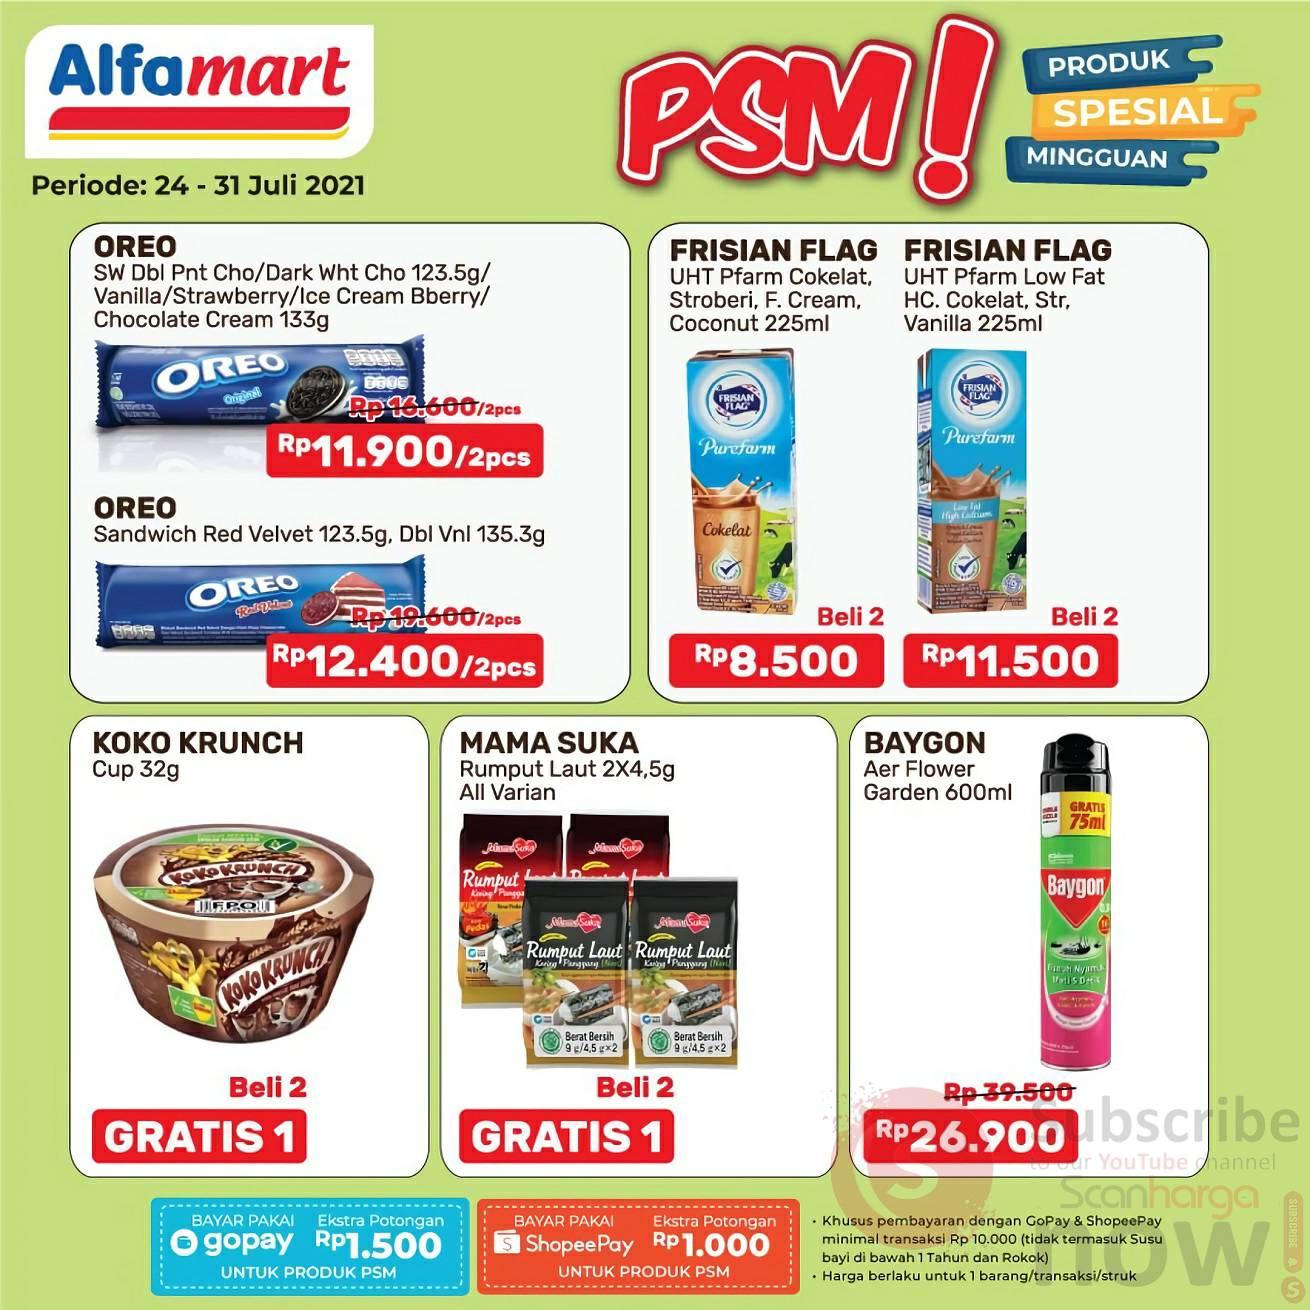 Katalog Promo PSM Alfamart Terbaru 24 - 31 Juli 2021